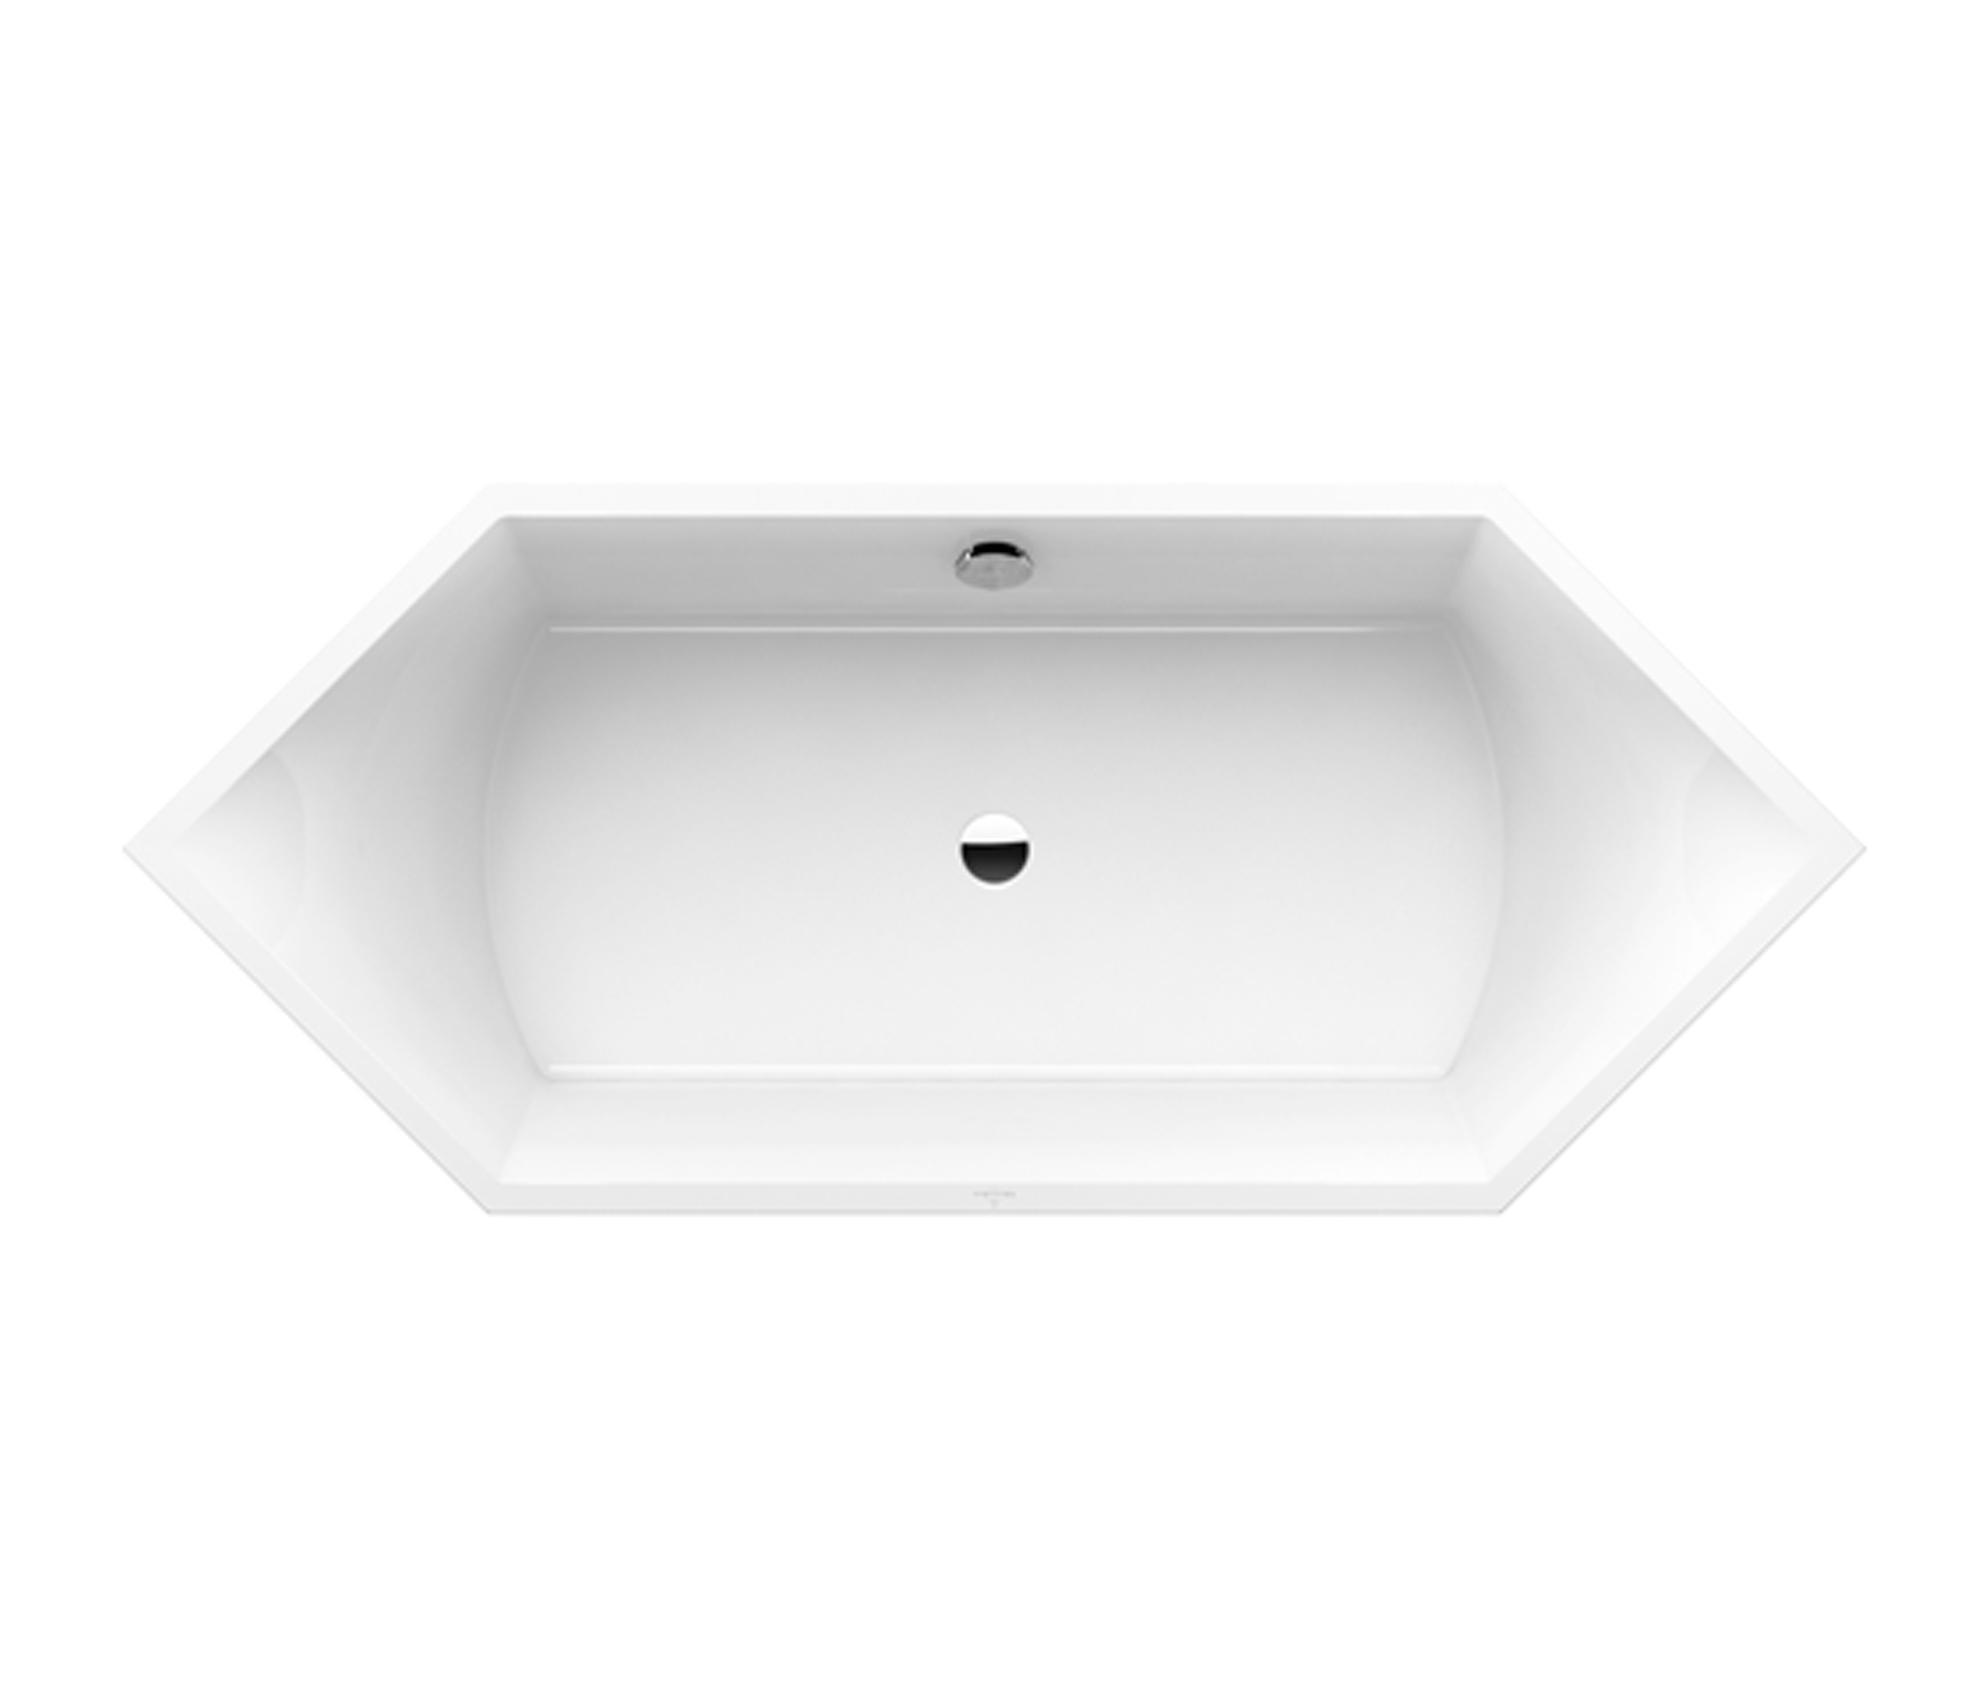 Squaro edge vasca da bagno vasche ad incasso villeroy boch architonic - Vasca da bagno villeroy e boch ...